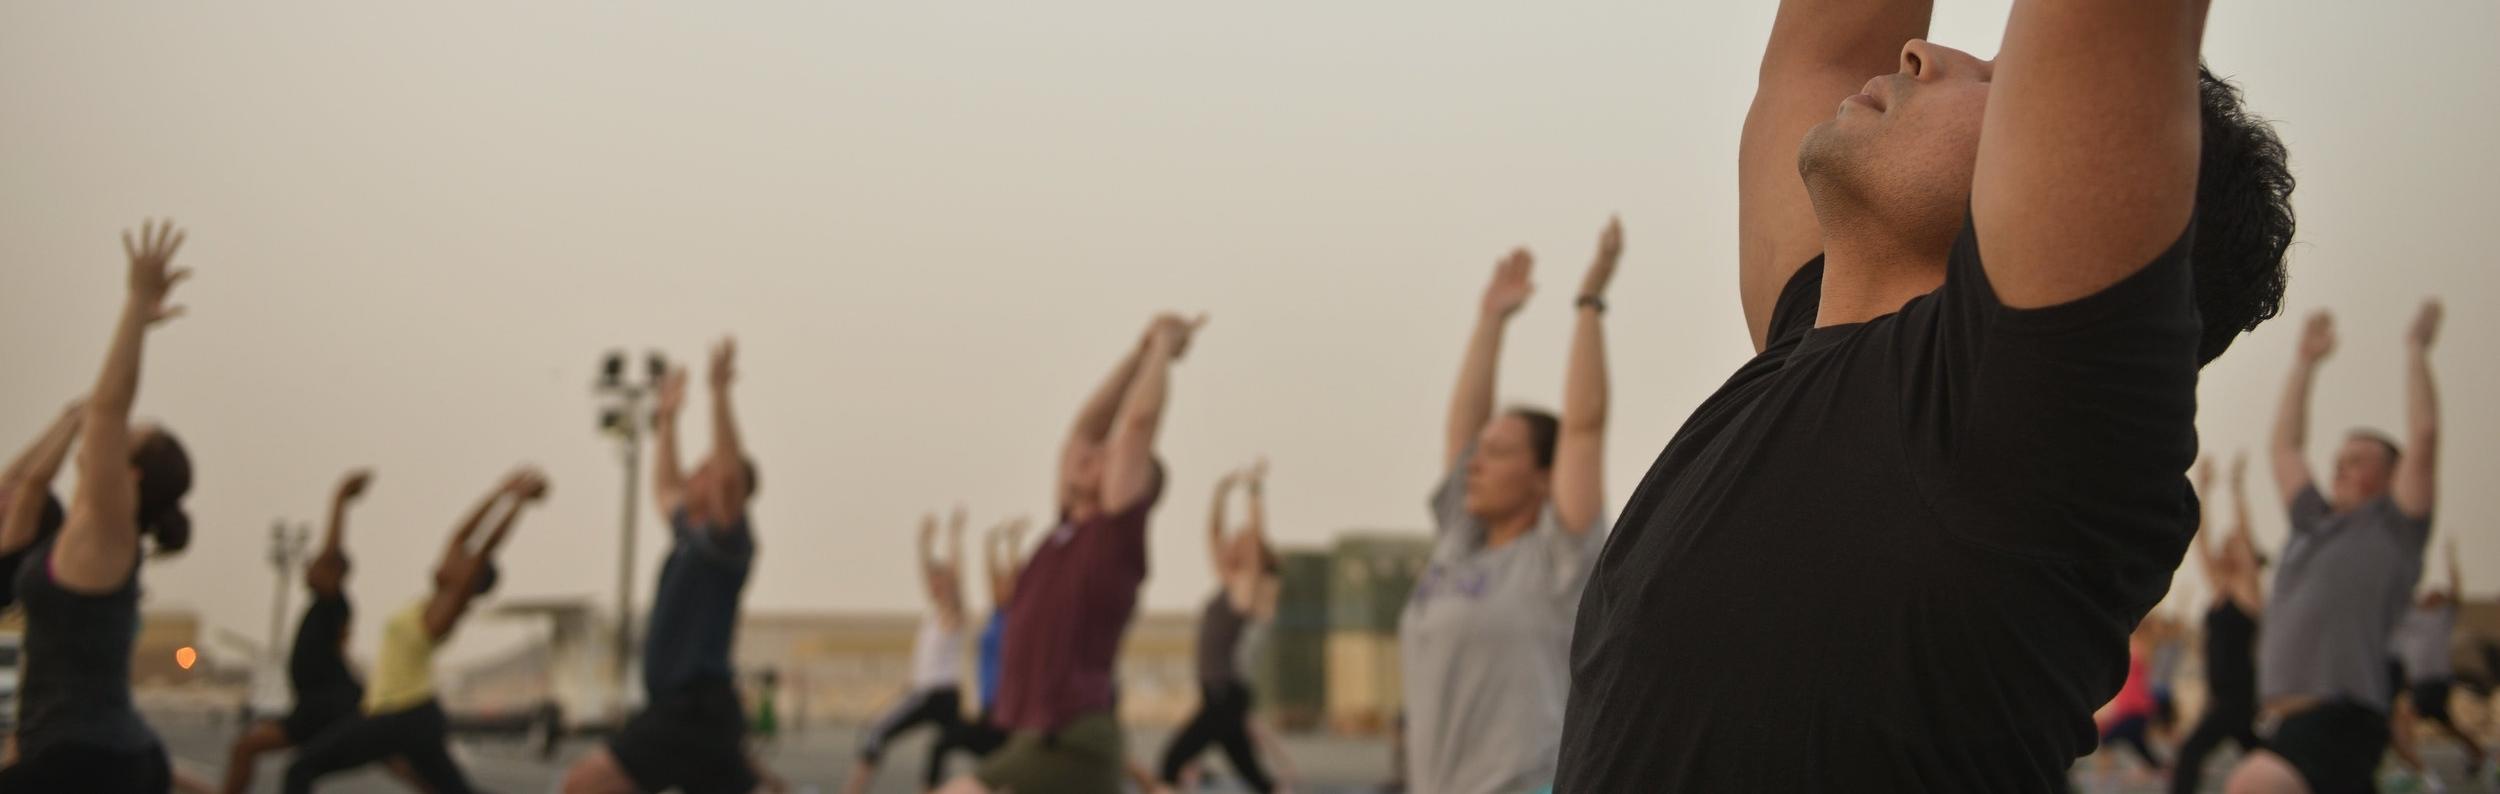 Canva - Men, Yoga Classes, Gym, Instructor, Hatha Yoga.jpg